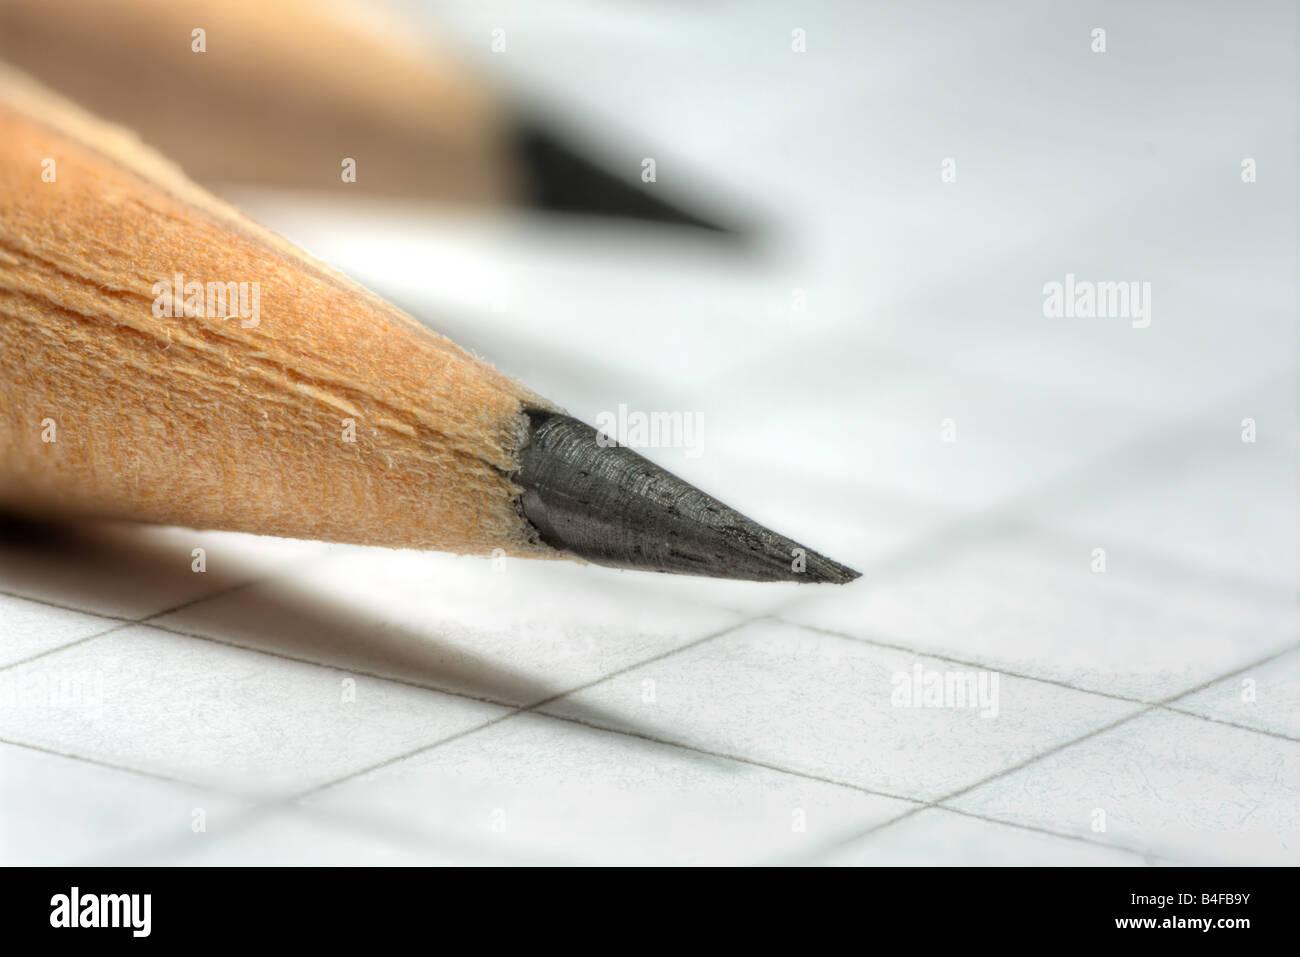 Pencil tip Stock Photo